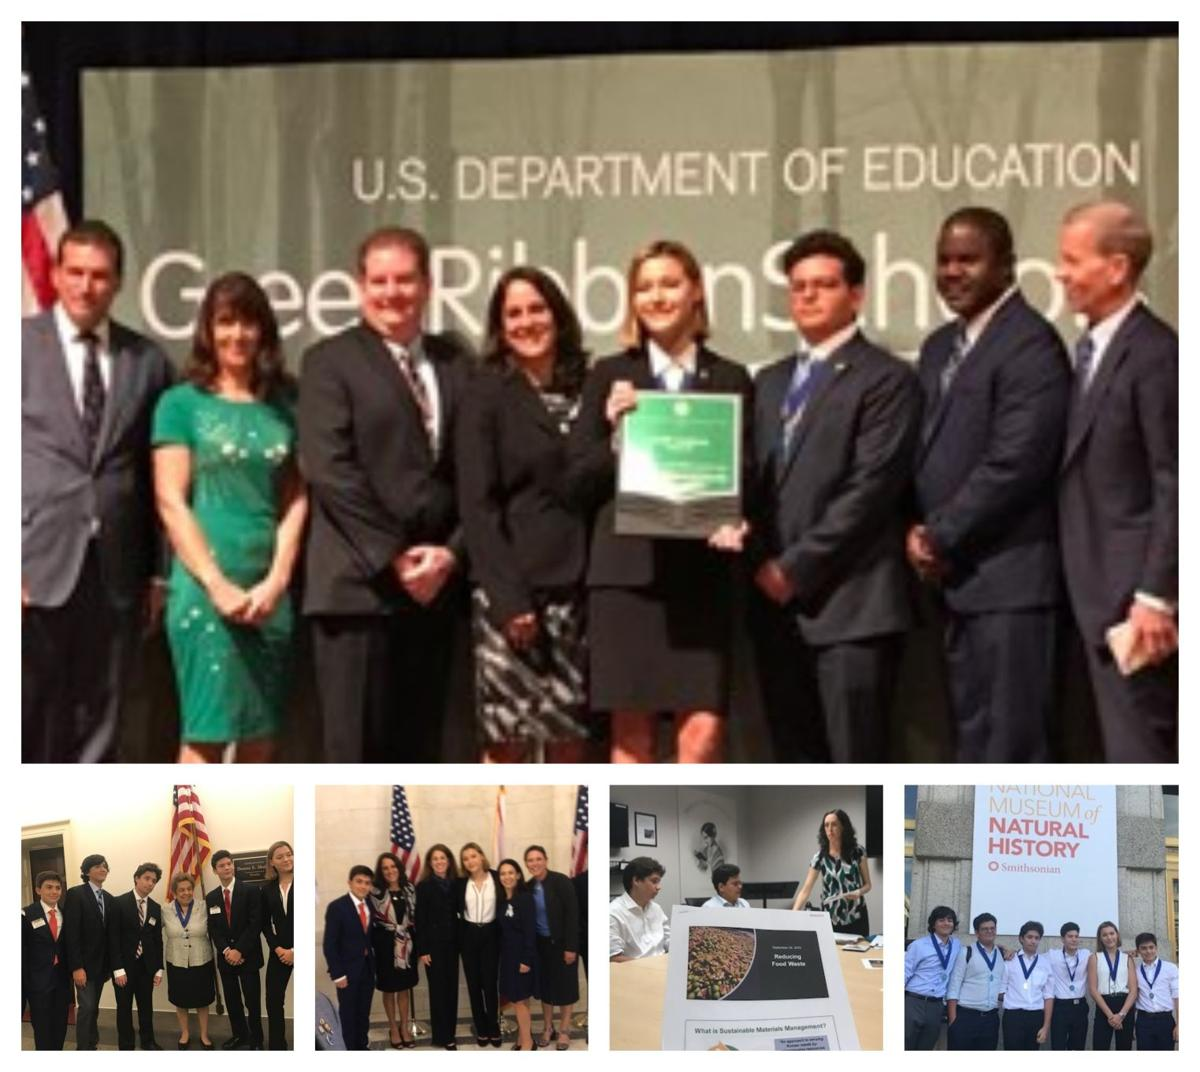 MAST Green Champions recognized on trip to Washington, DC